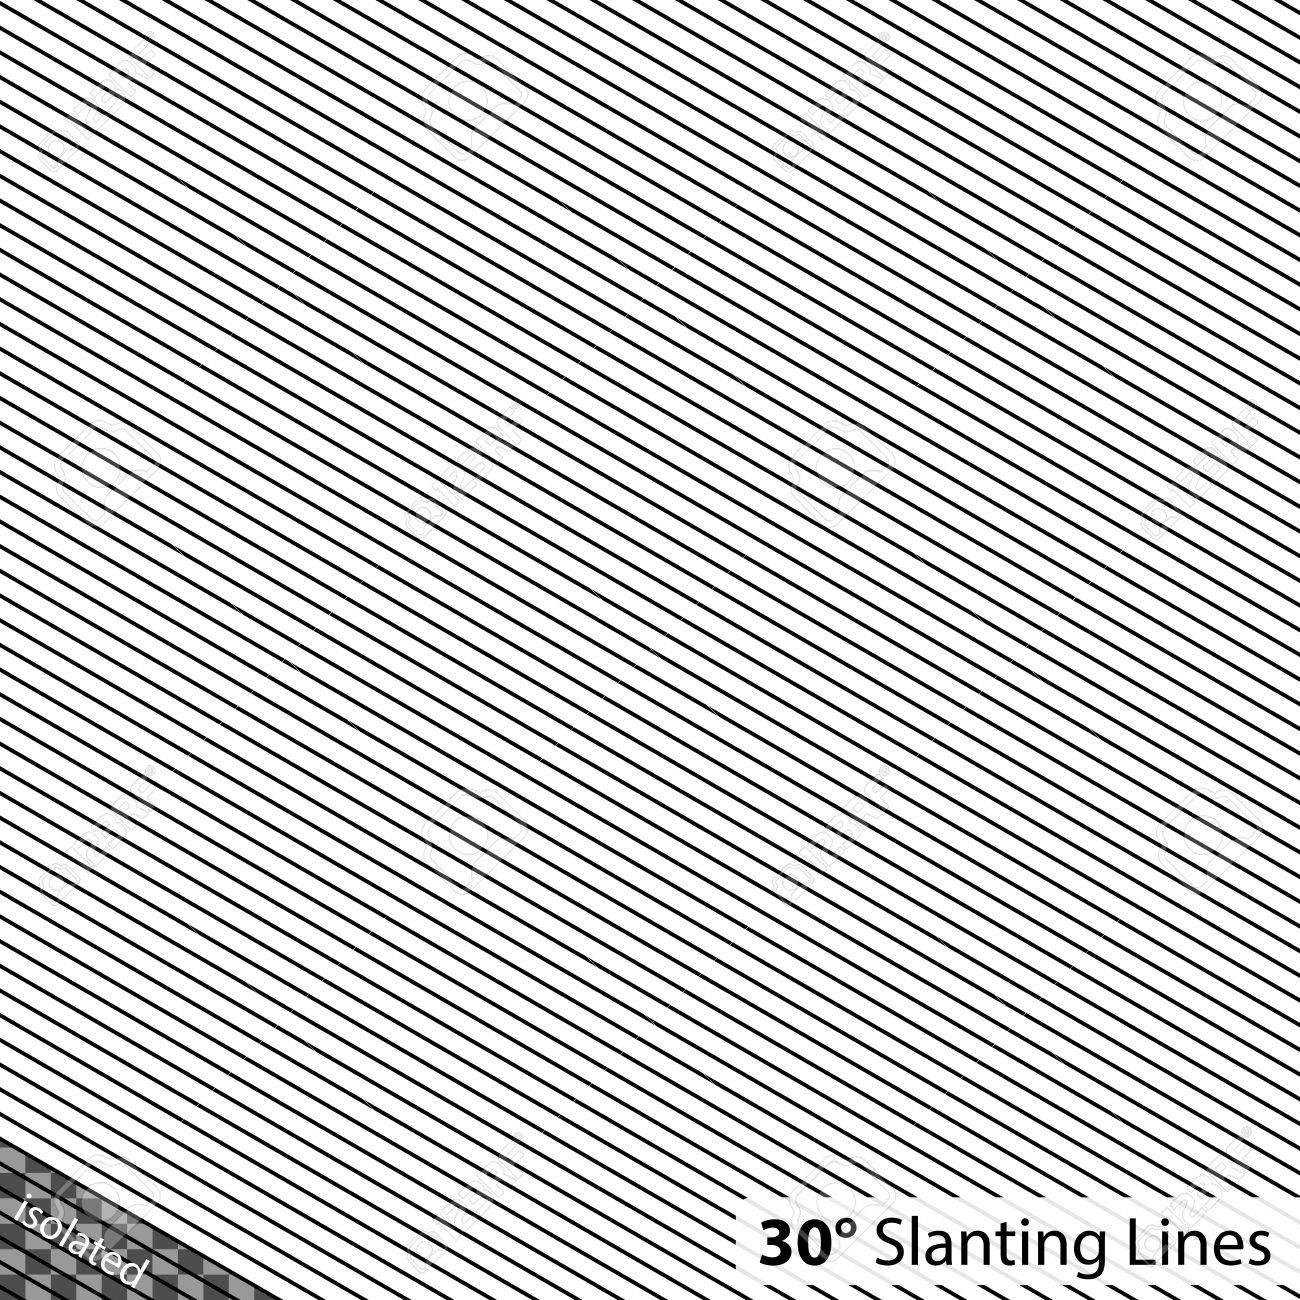 Simple 30 degree Slanting Lines - 51755946